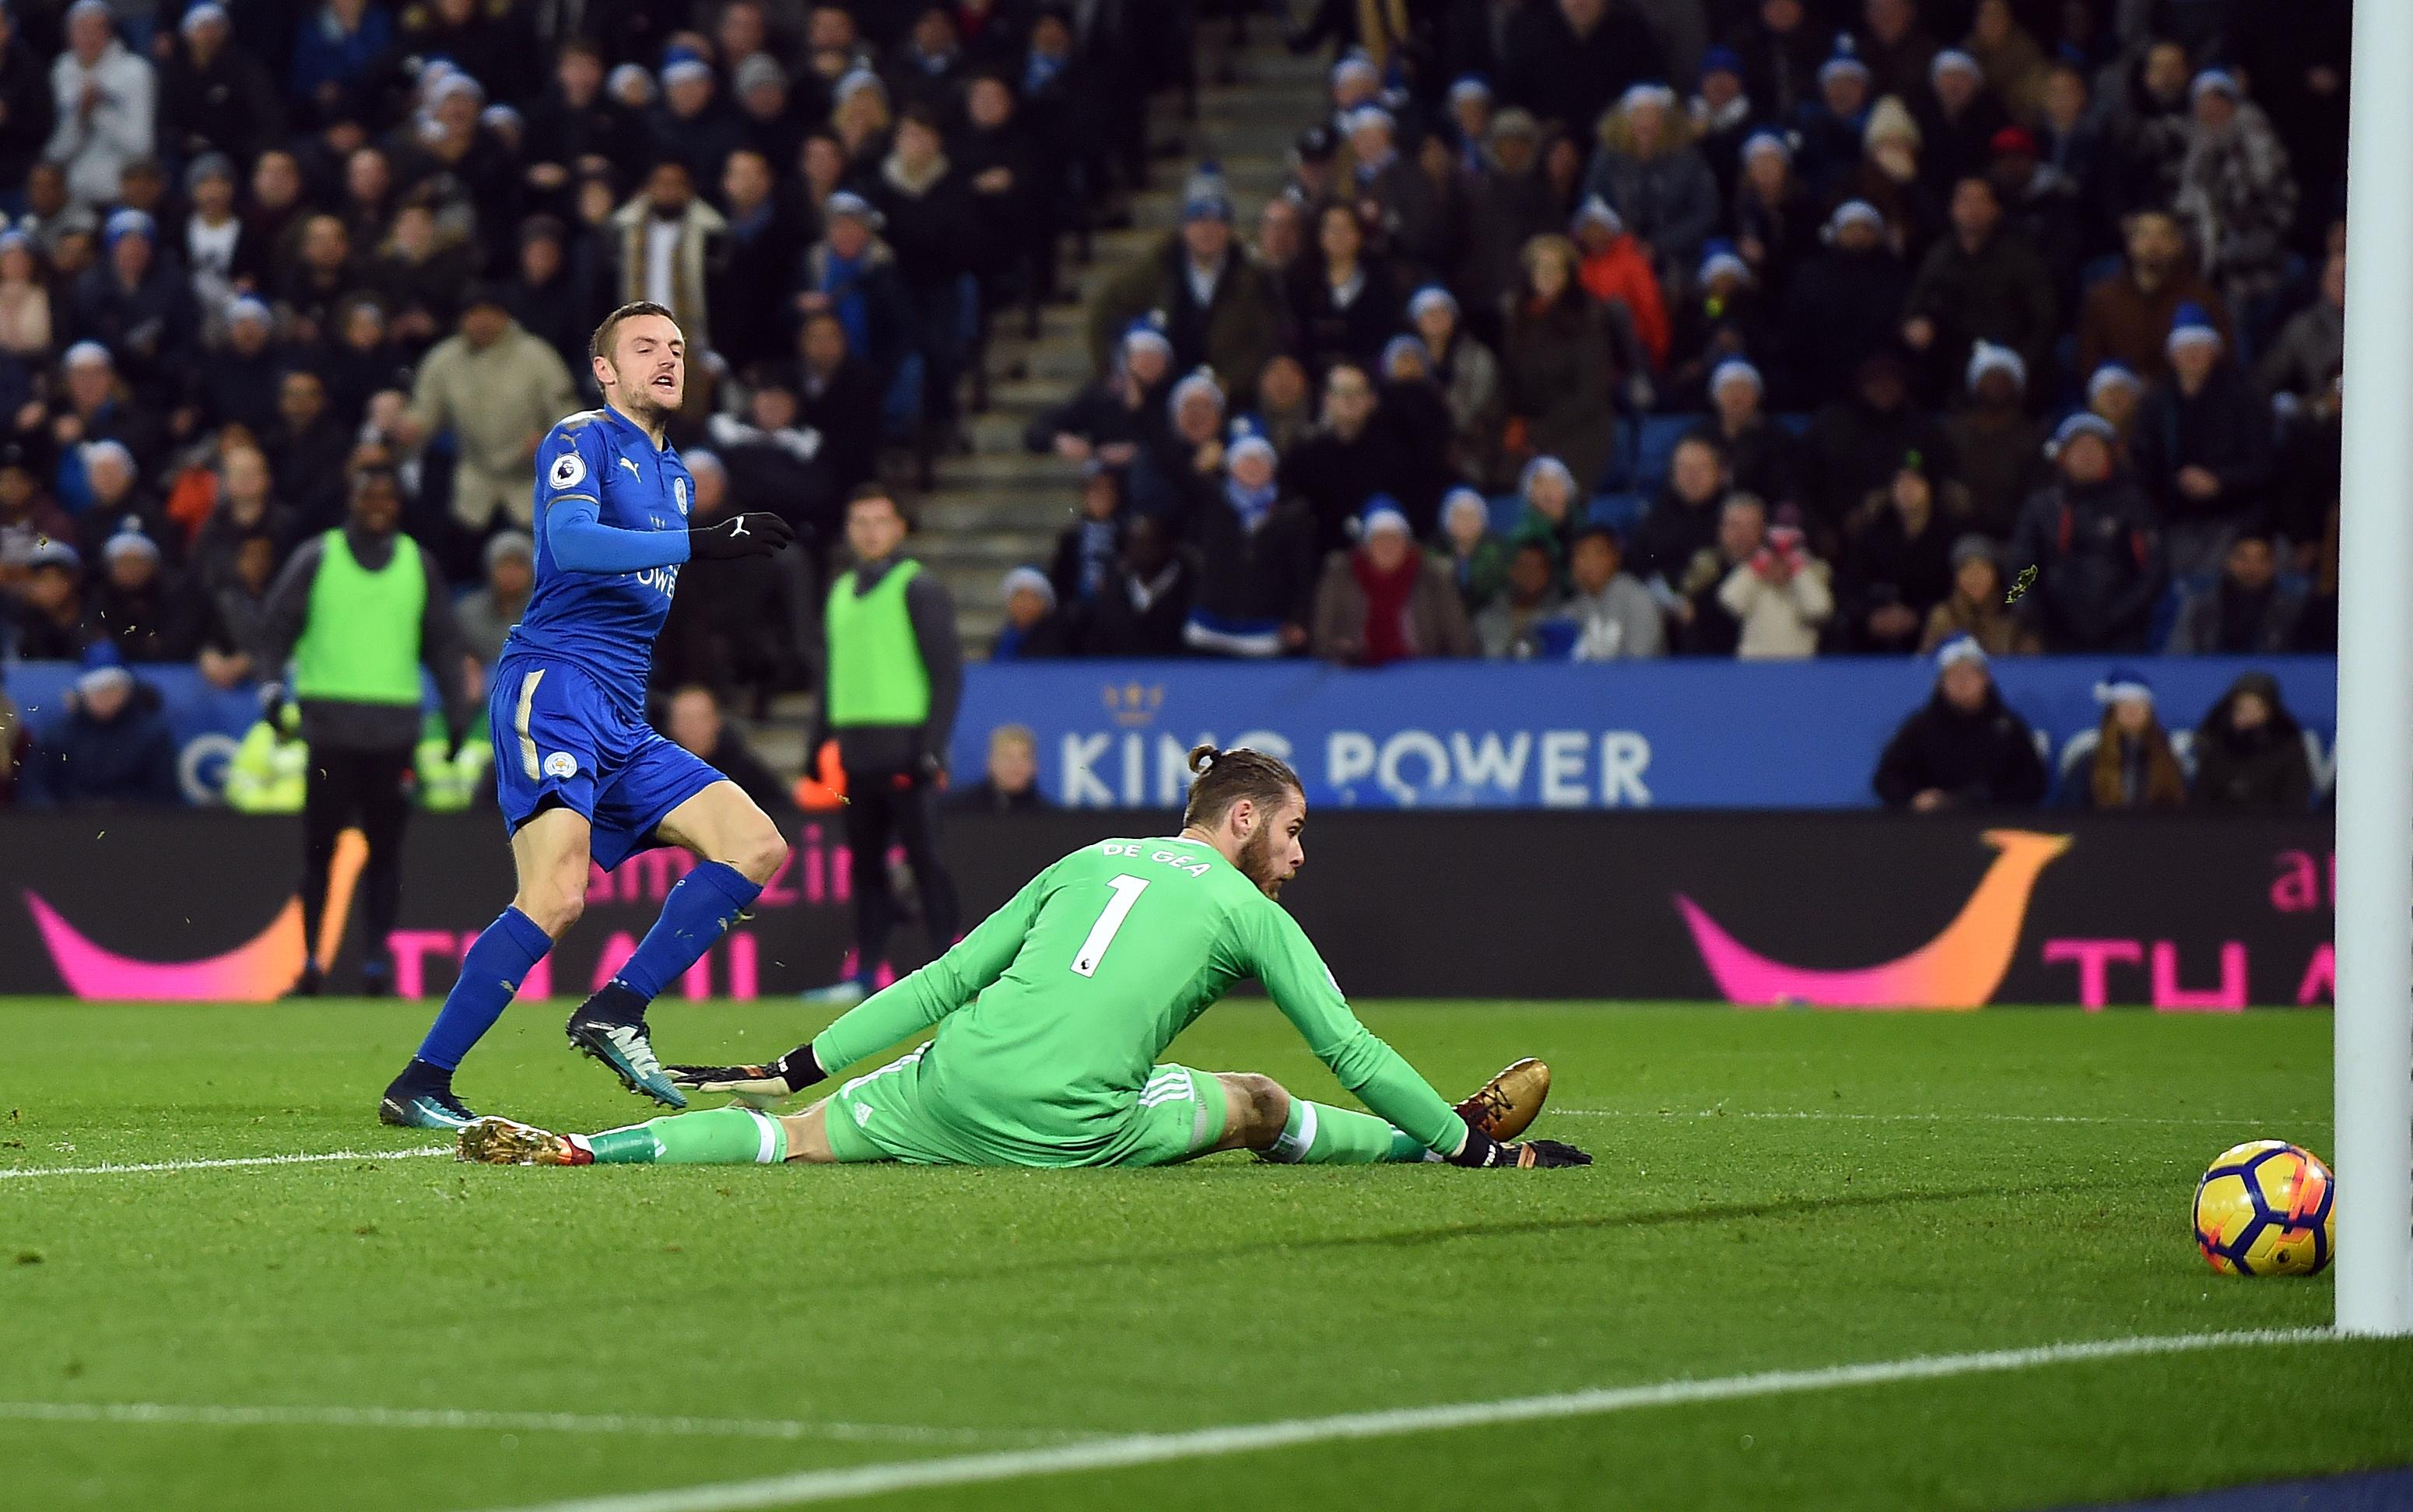 Southampton vs Leicester odds - Premier League - King Power Stadium